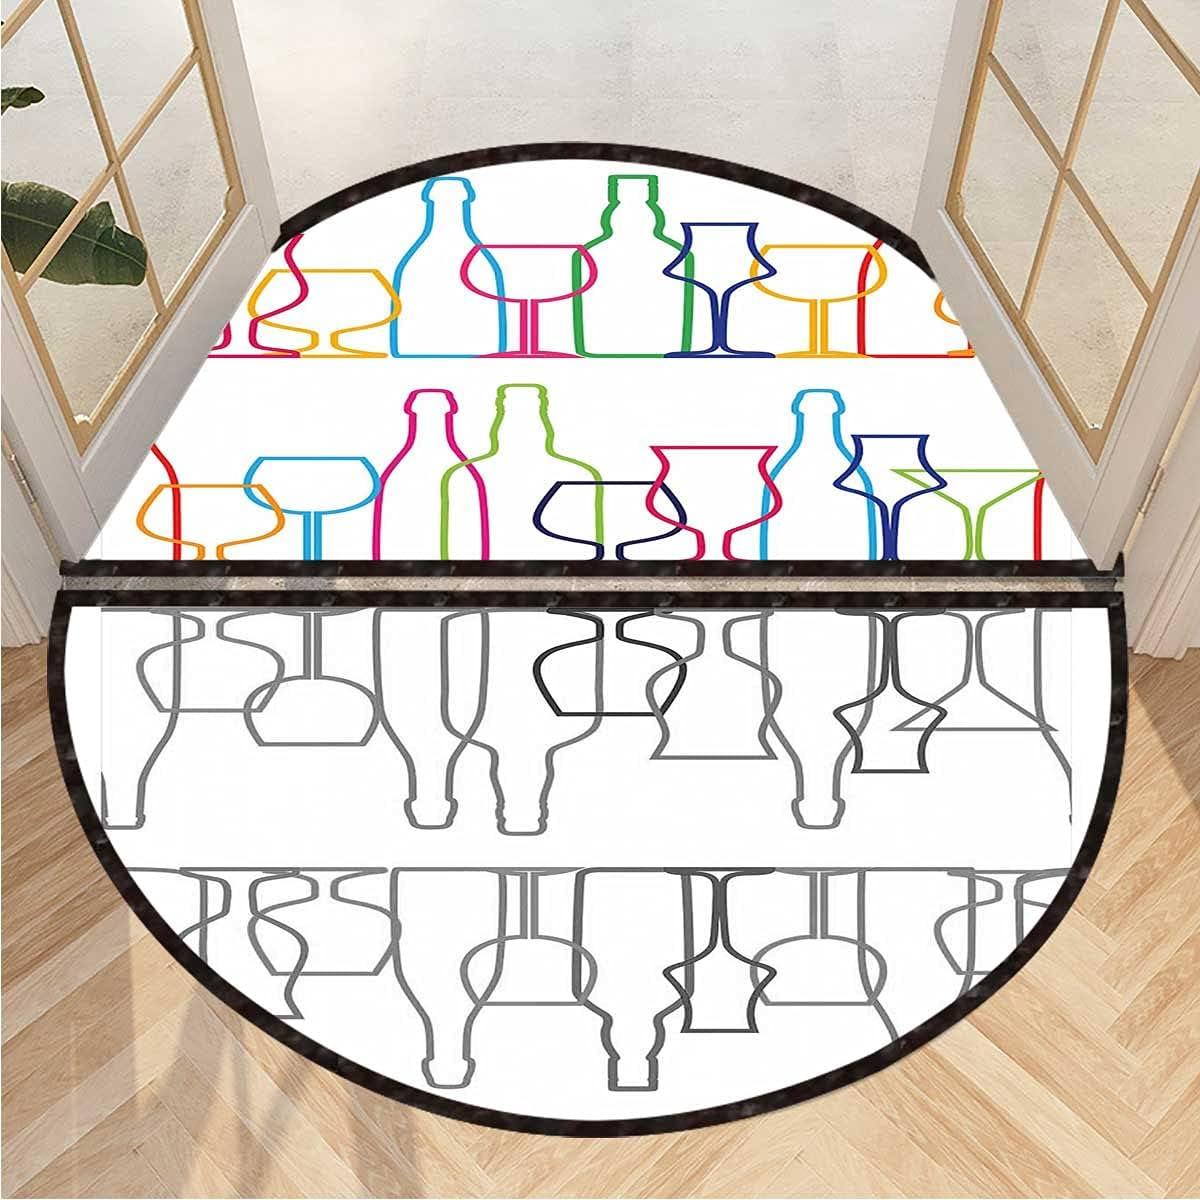 Semicircular Floor Mat Colorful Outline Ranking TOP13 Door Bottles 3D Ranking TOP13 Printing